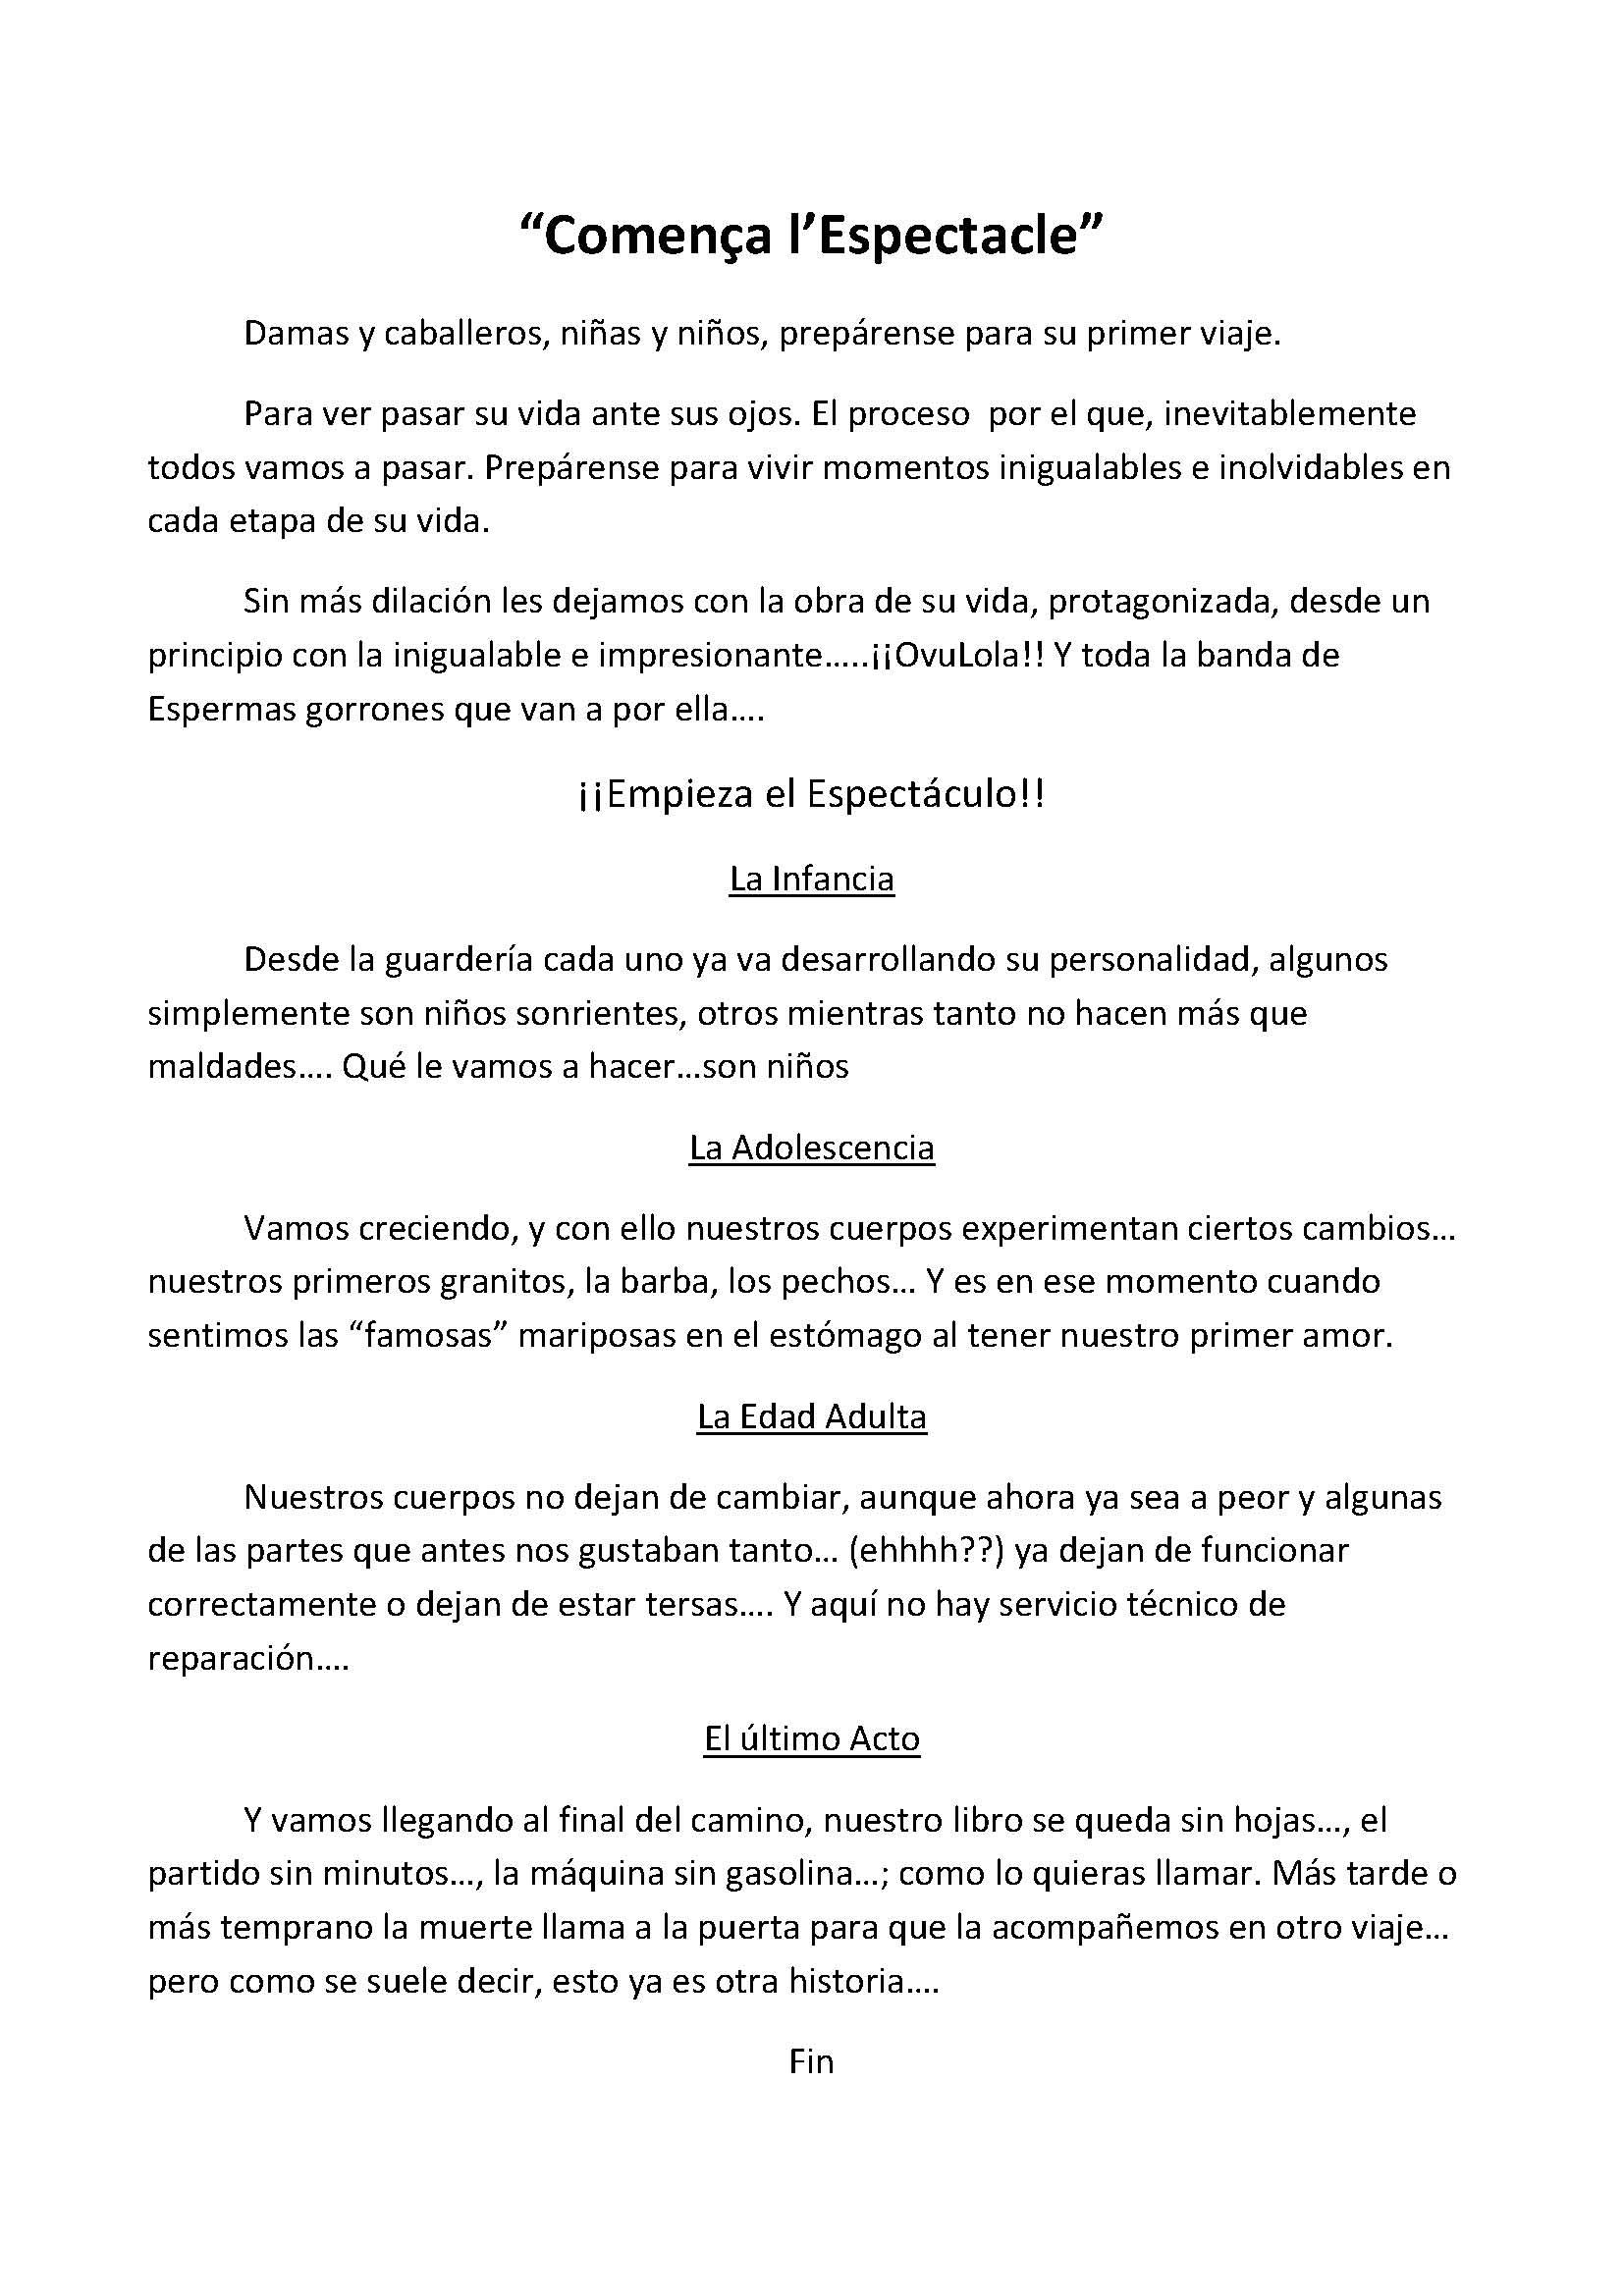 Espectacle (Ripalda-Beneficencia)